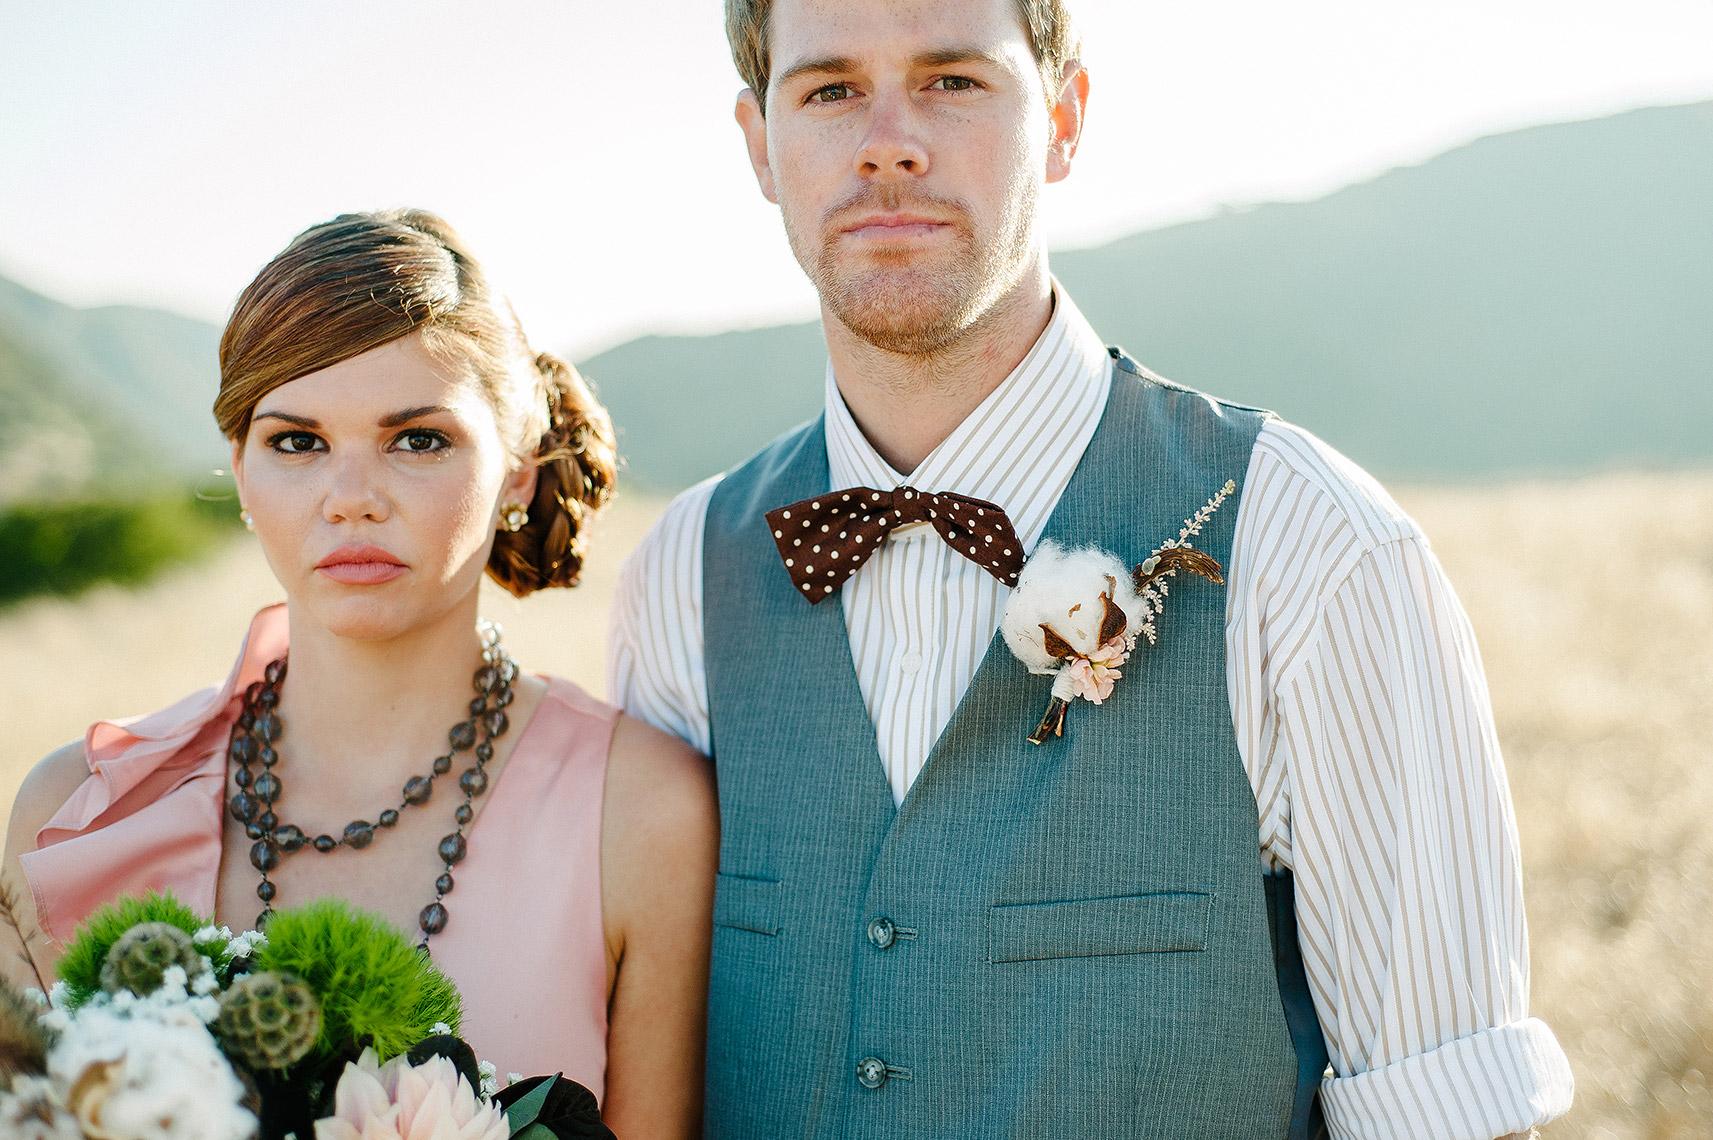 john-schnack-photography-san-diego-wedding-inspiration-shoot-back-country-vintage-wedding-39.jpg